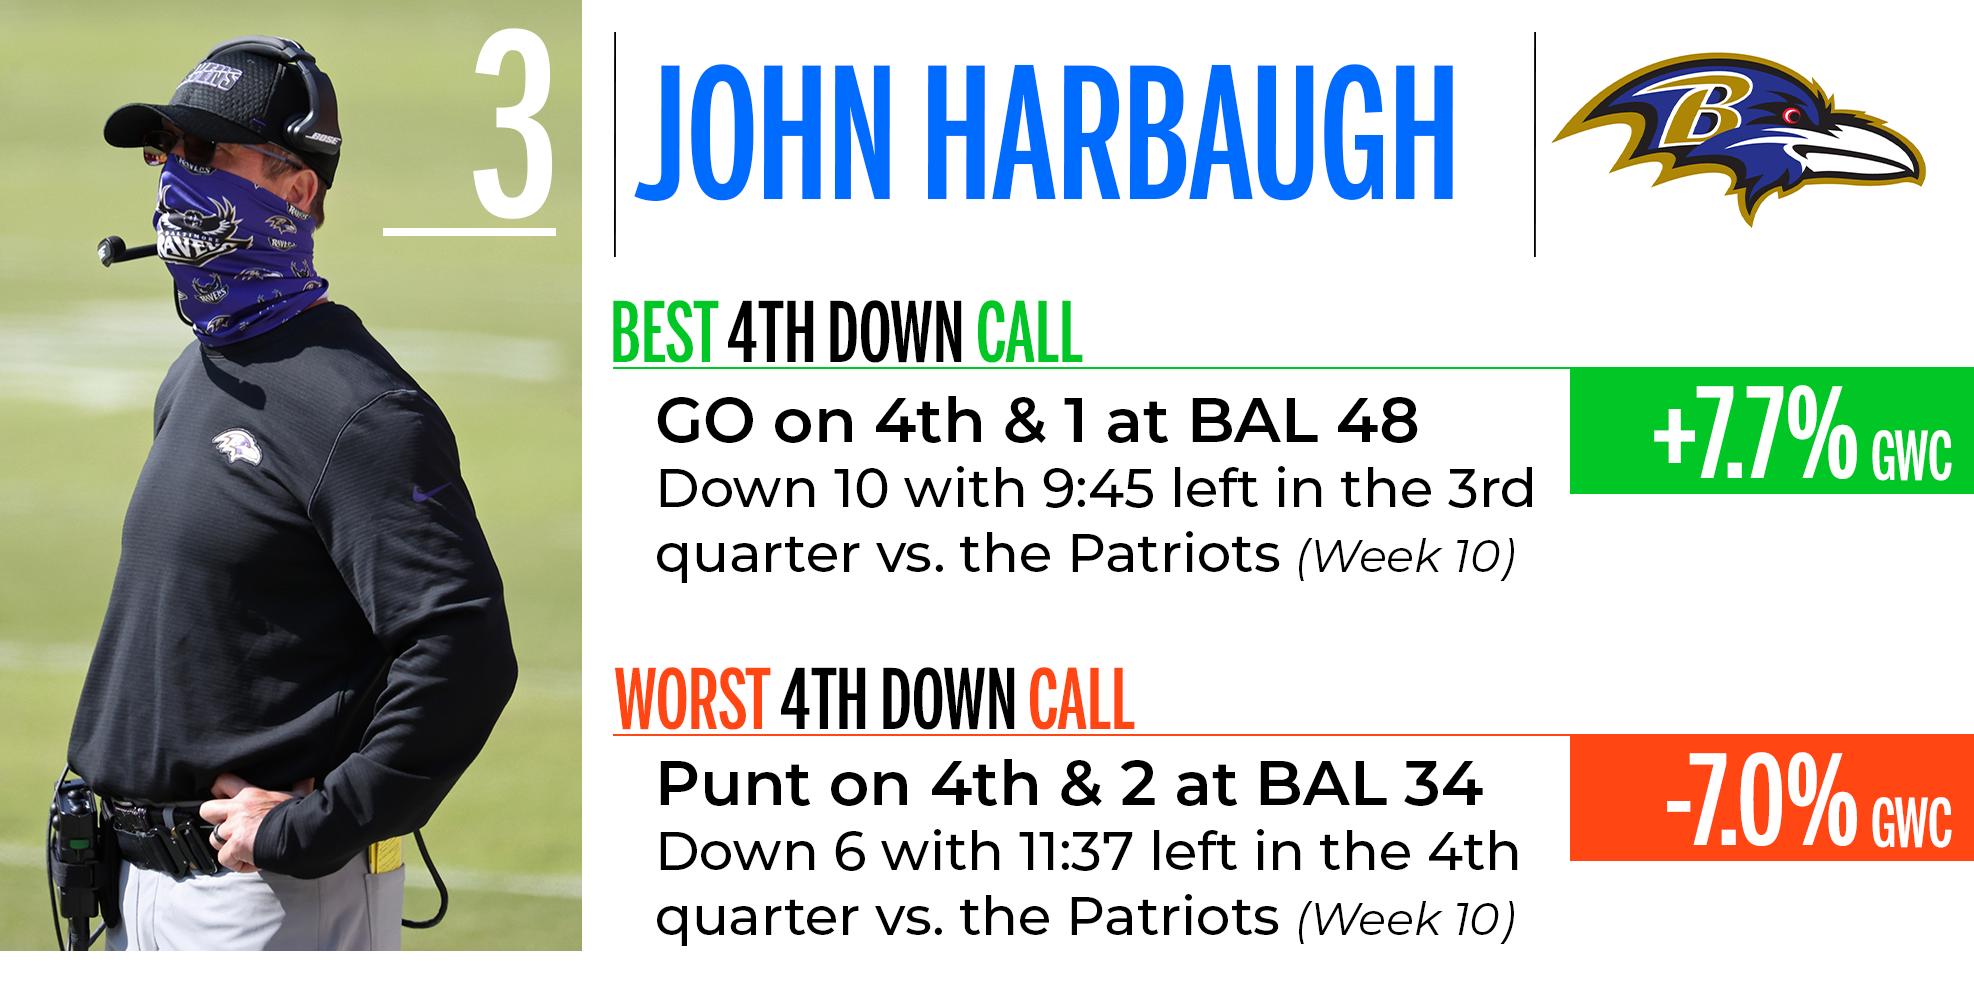 Harbaugh